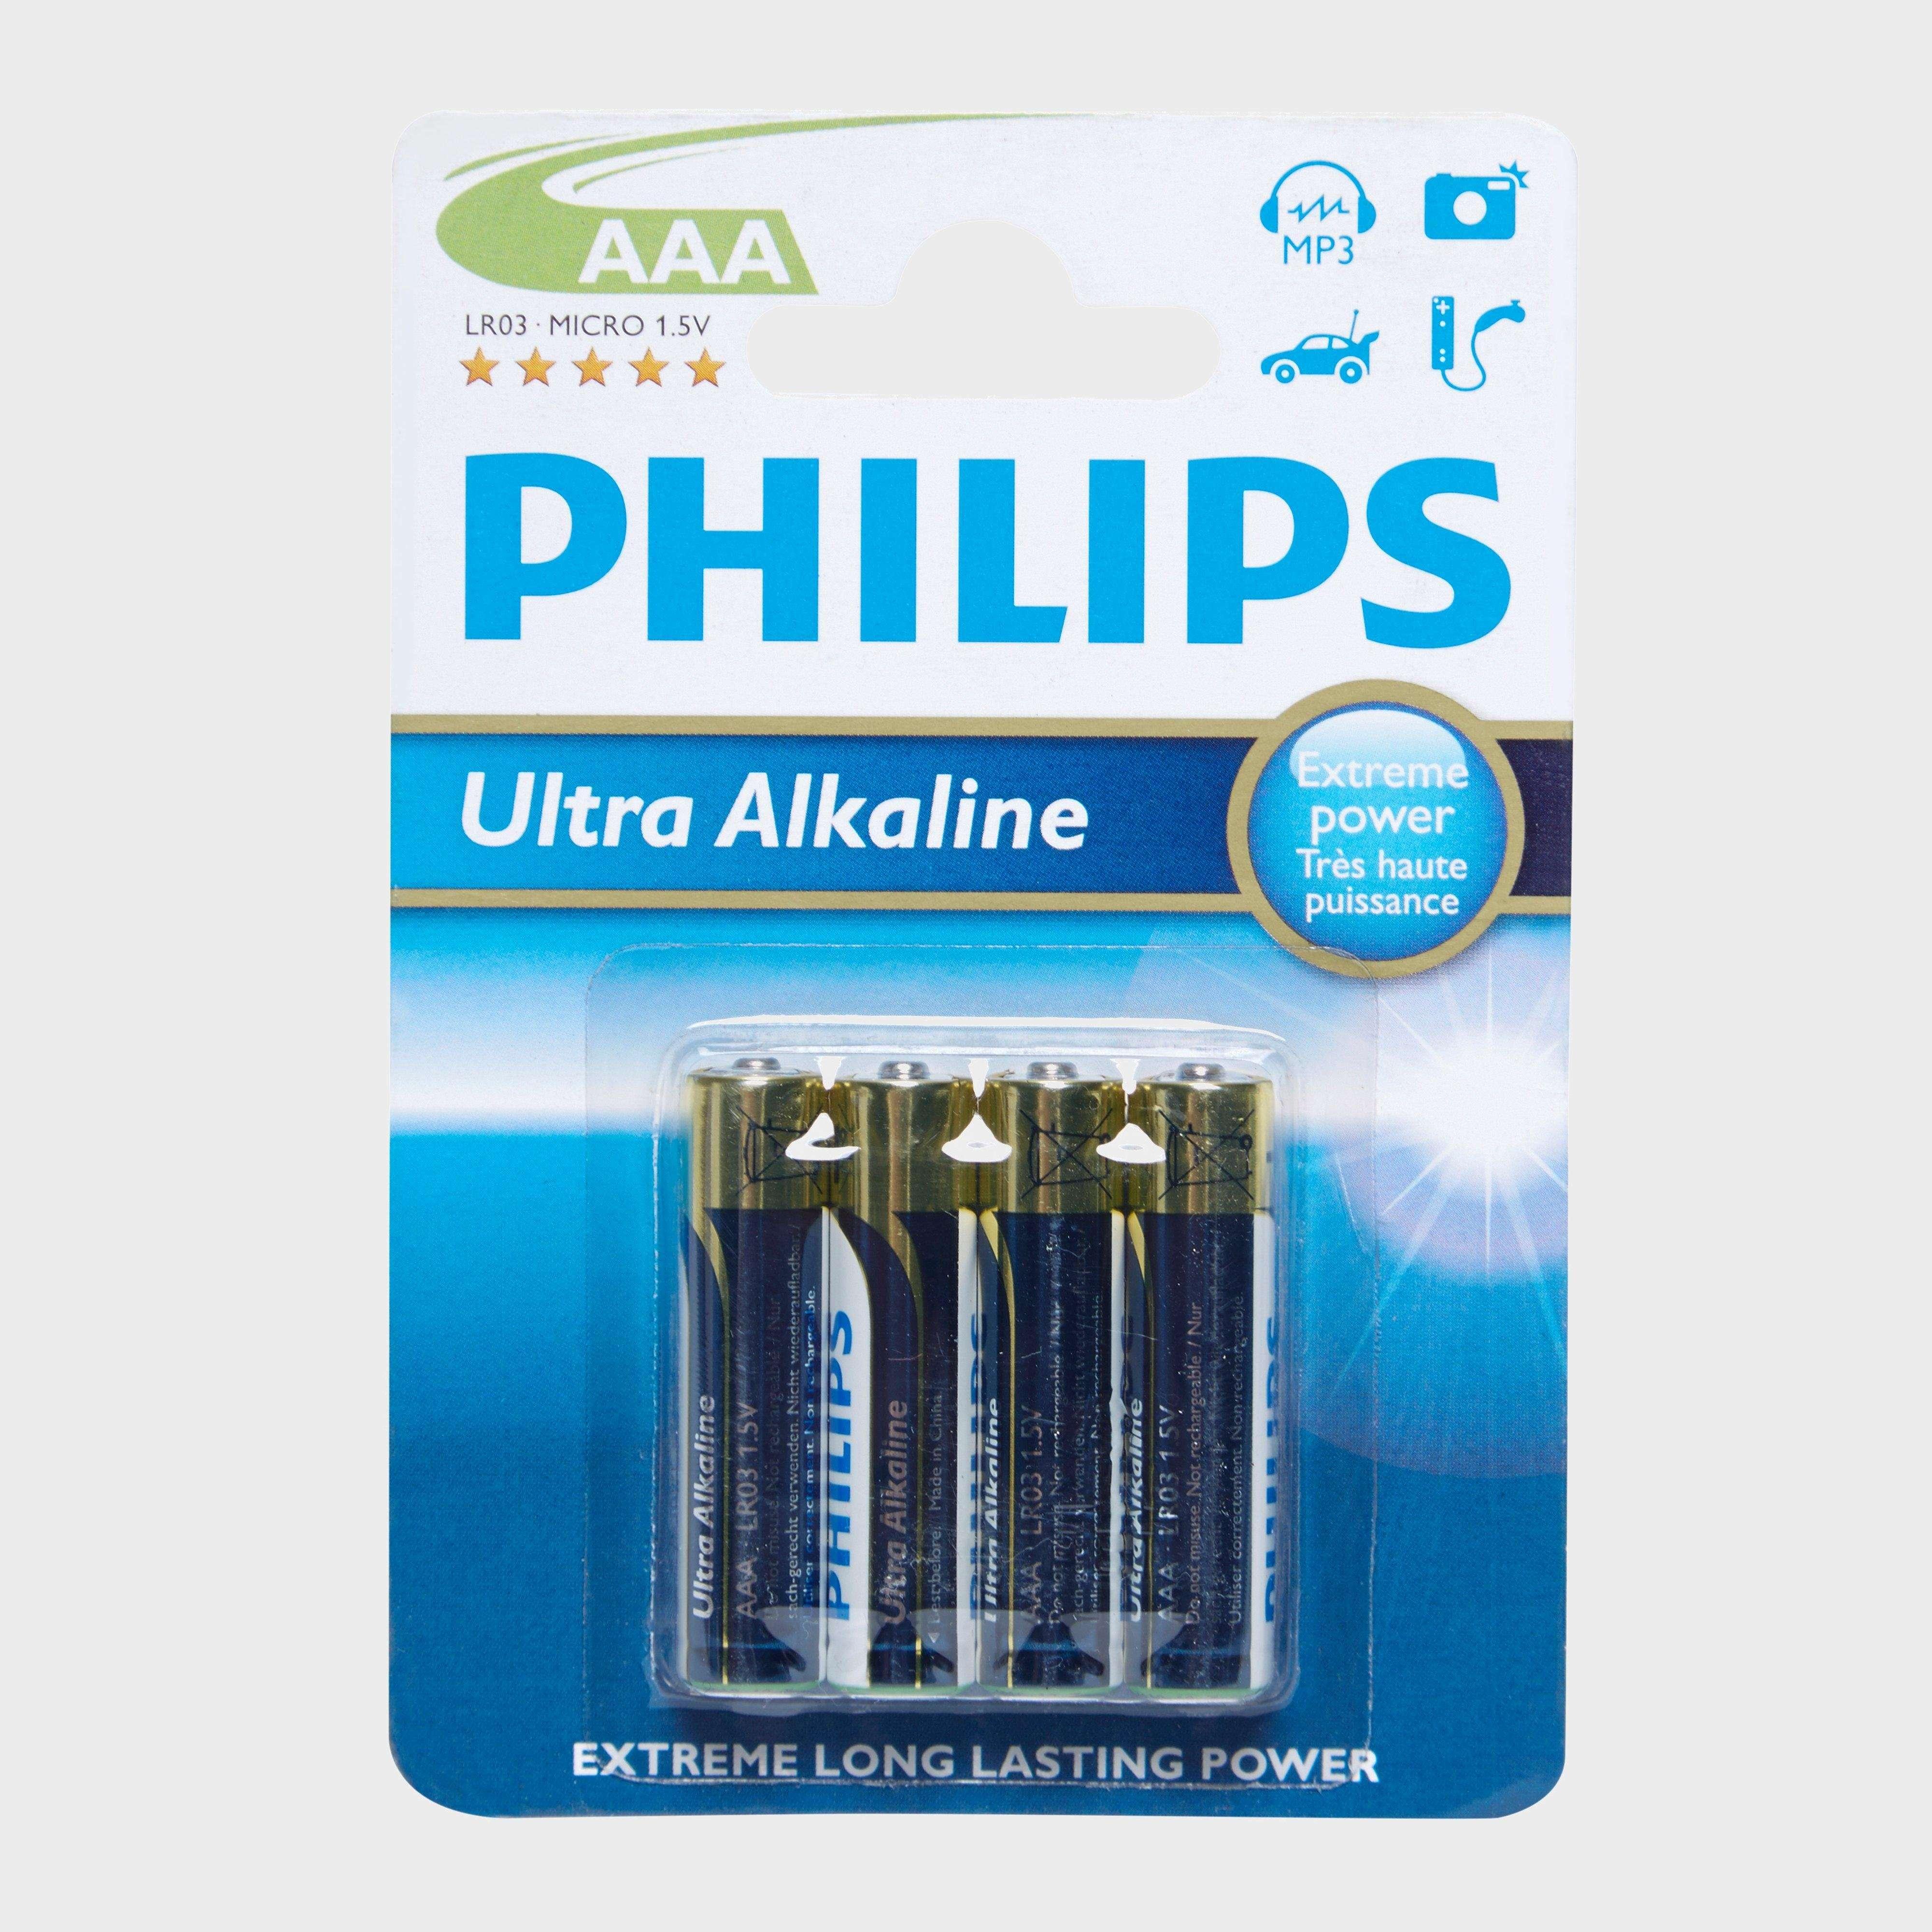 PHILLIPS Ultra Alkaline AAA LR03 Batteries 4 Pack